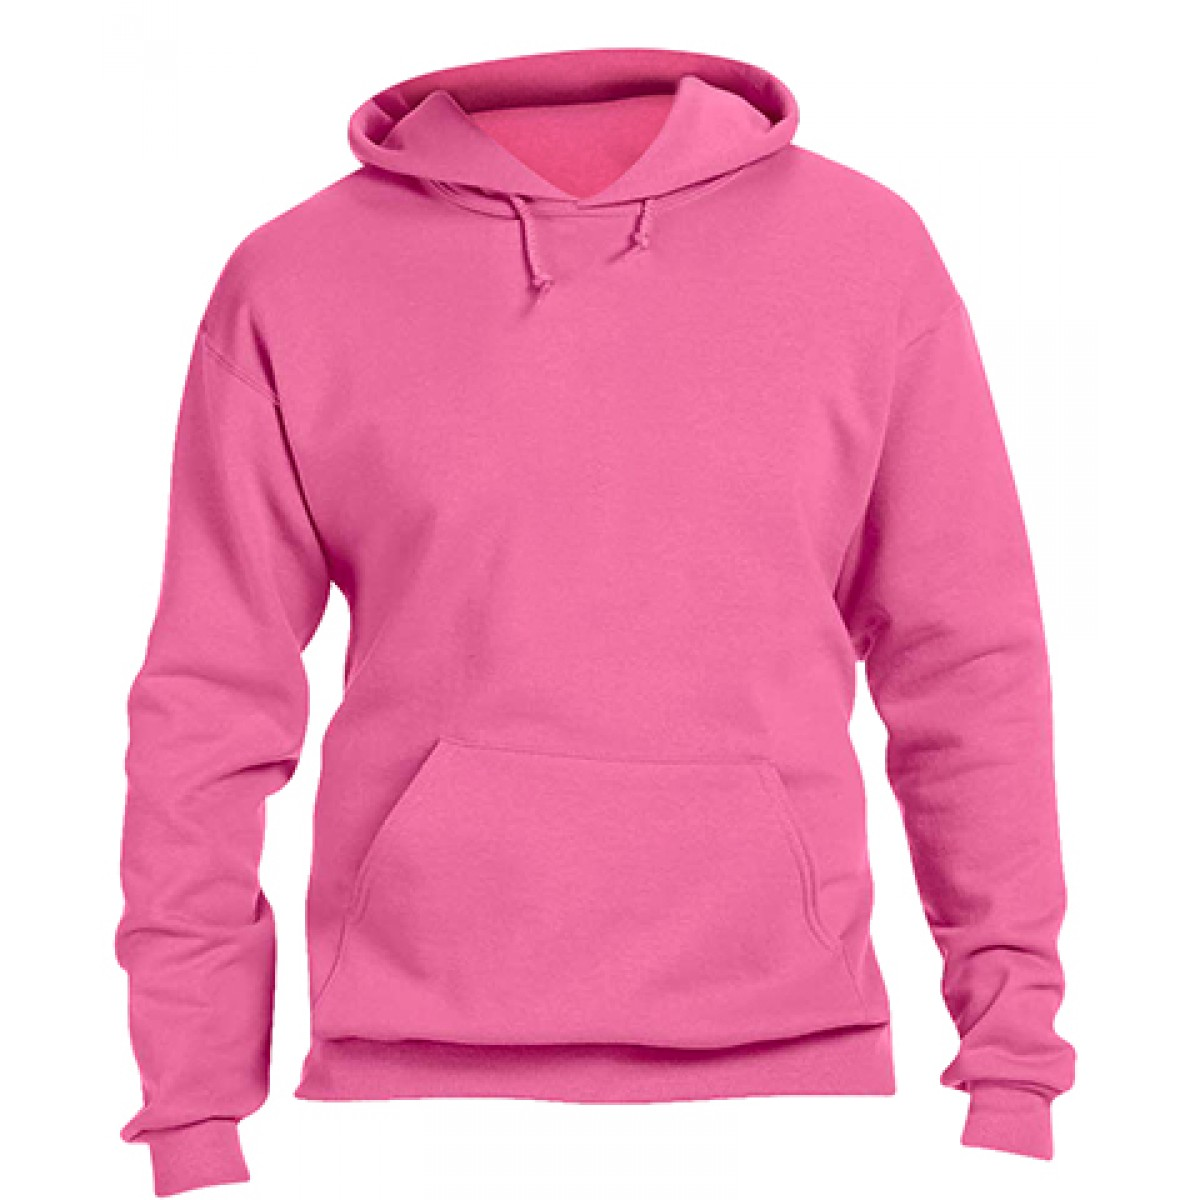 Pullover Hood 50/50 Preshrunk Fleece-Neon-Pink-2XL